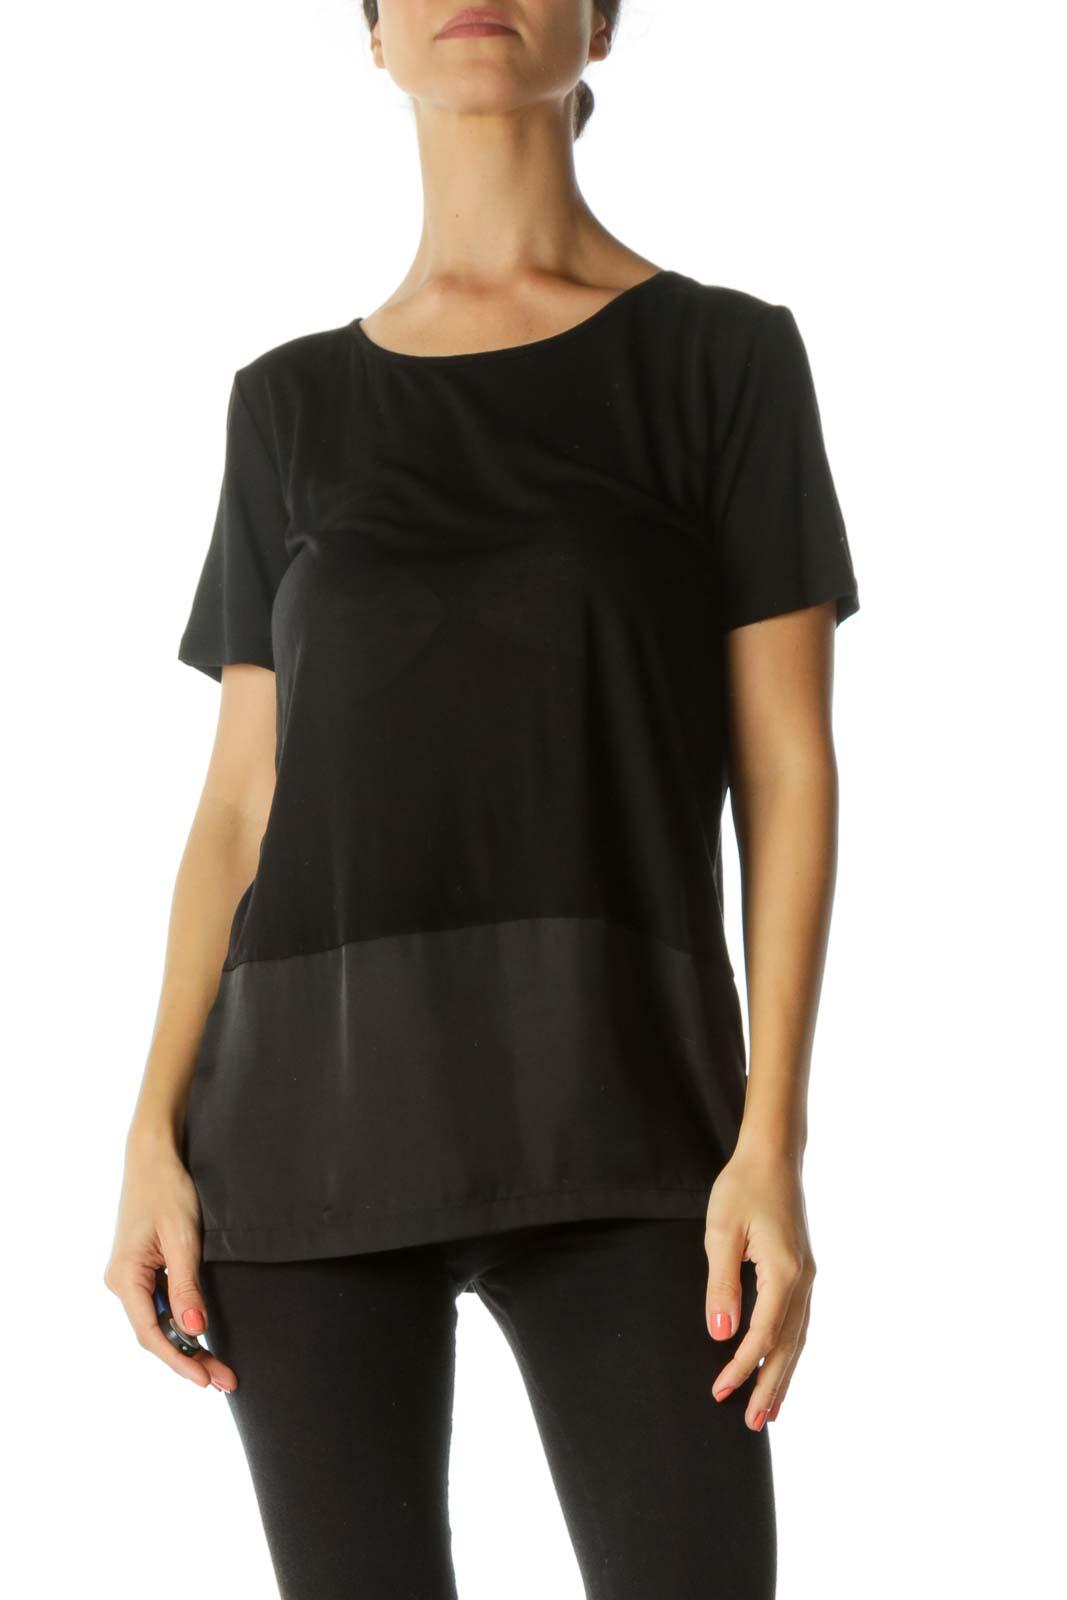 Black Round Neck Mixed-Media Stretch Short-Sleeve Top